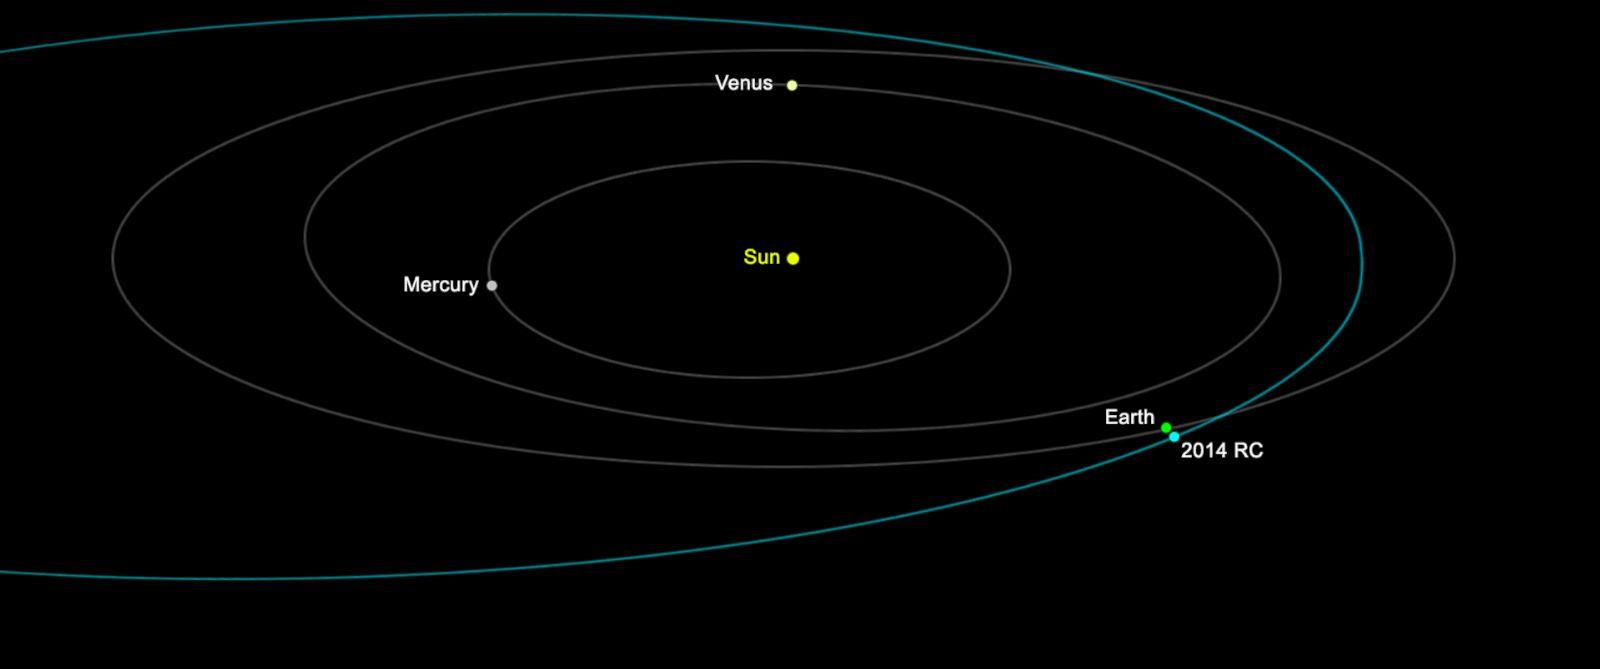 jpl nasa asteroid watch - photo #49